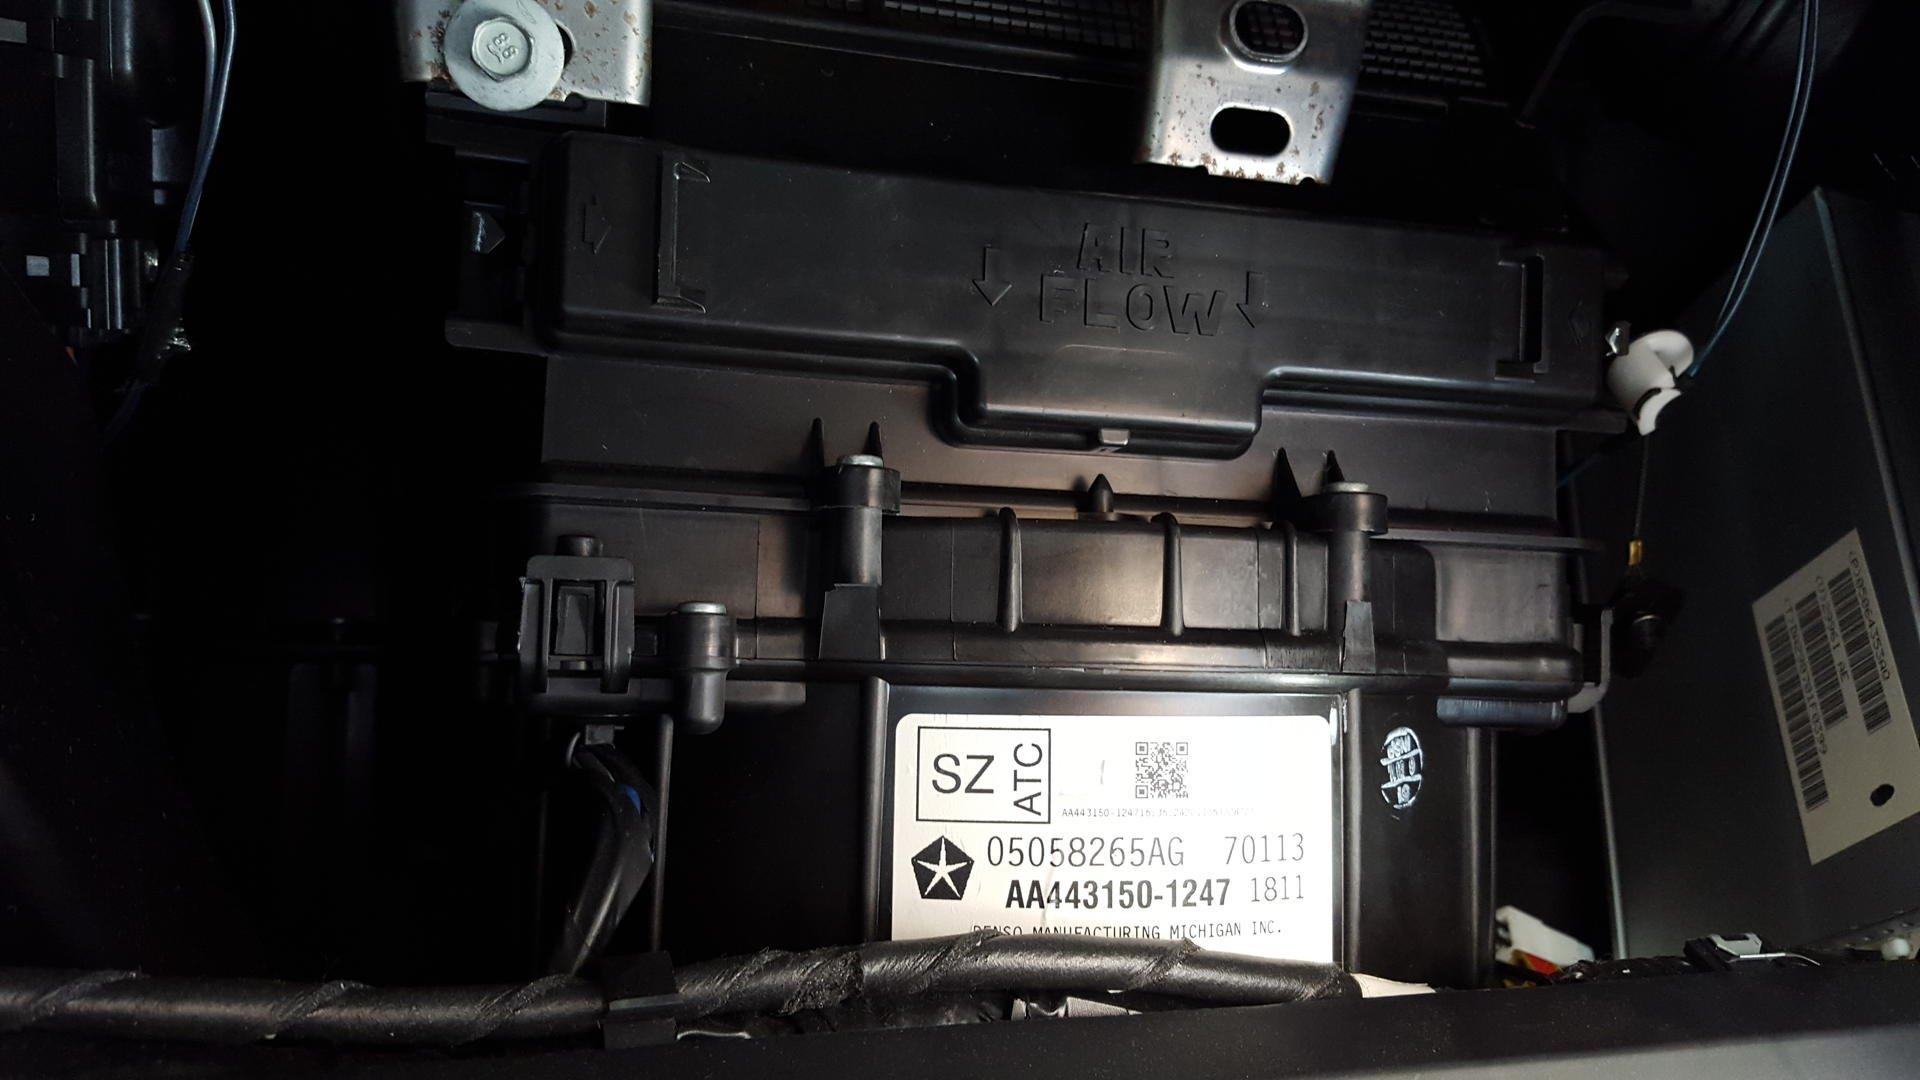 D St Gen Diy Cabin Air Filter Replacement on 2015 Chrysler 200 Cabin Air Filter Location